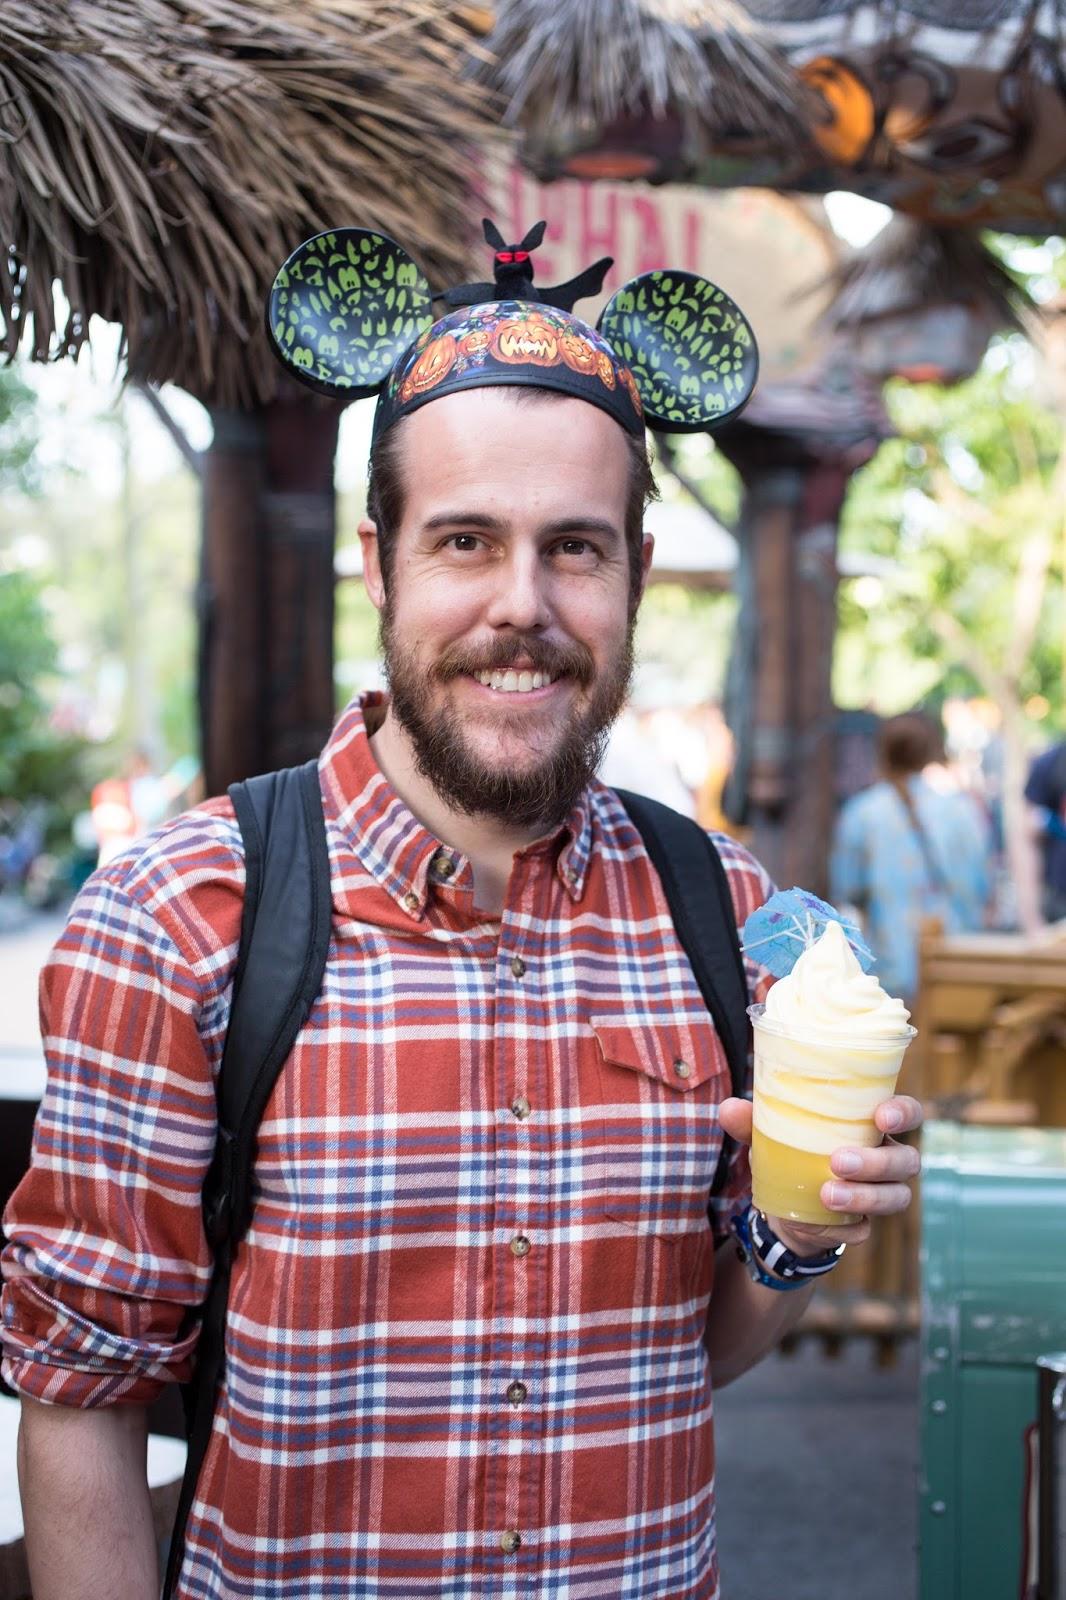 Disneyland Food Guide: Dole Whip